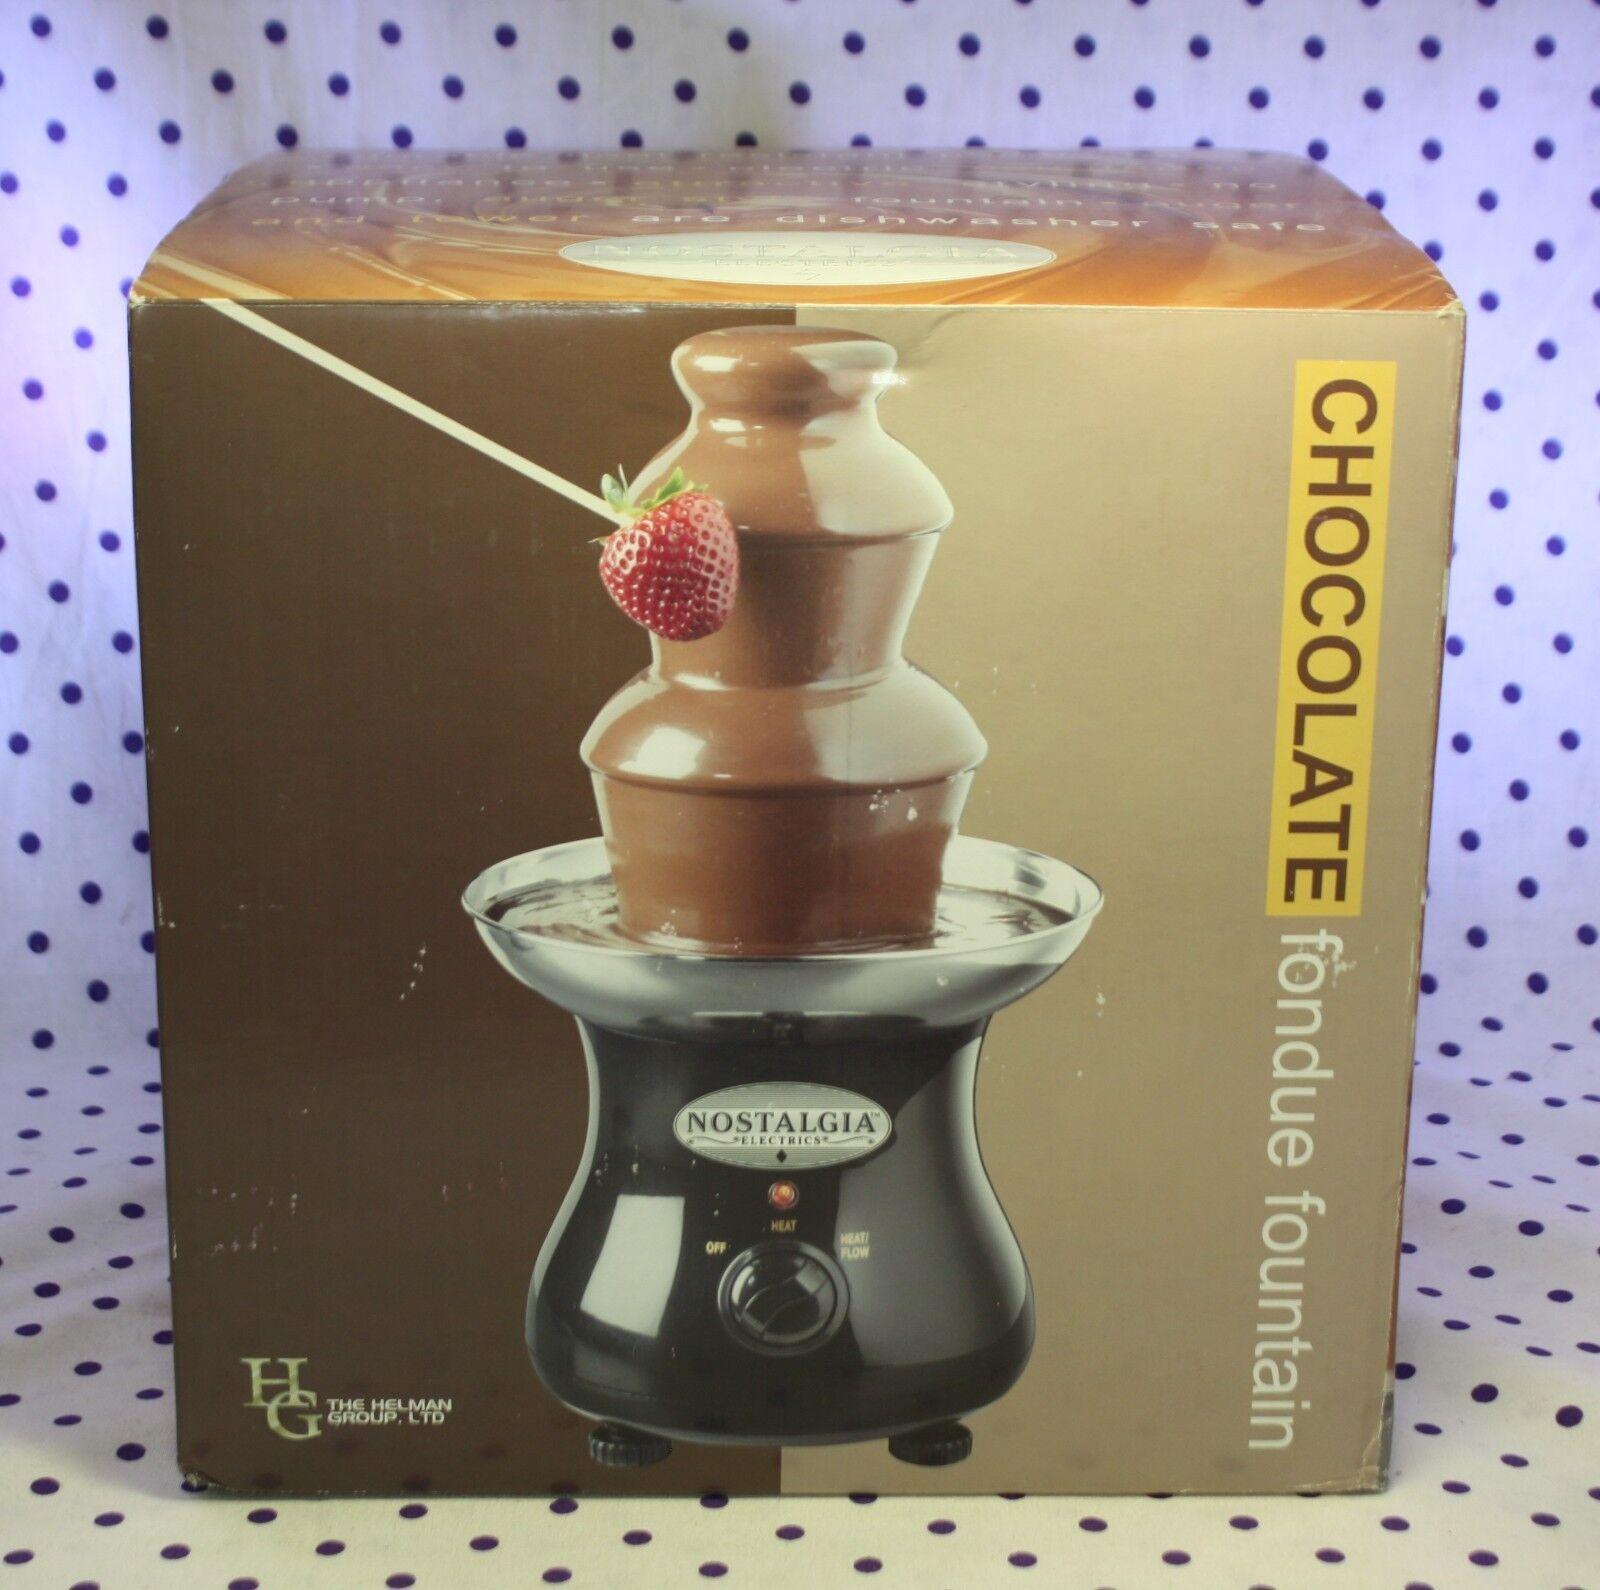 Russell Stover 3-Tier Fondue Au Chocolat Fontaine En Acier Inoxydable Bol Nostalgie